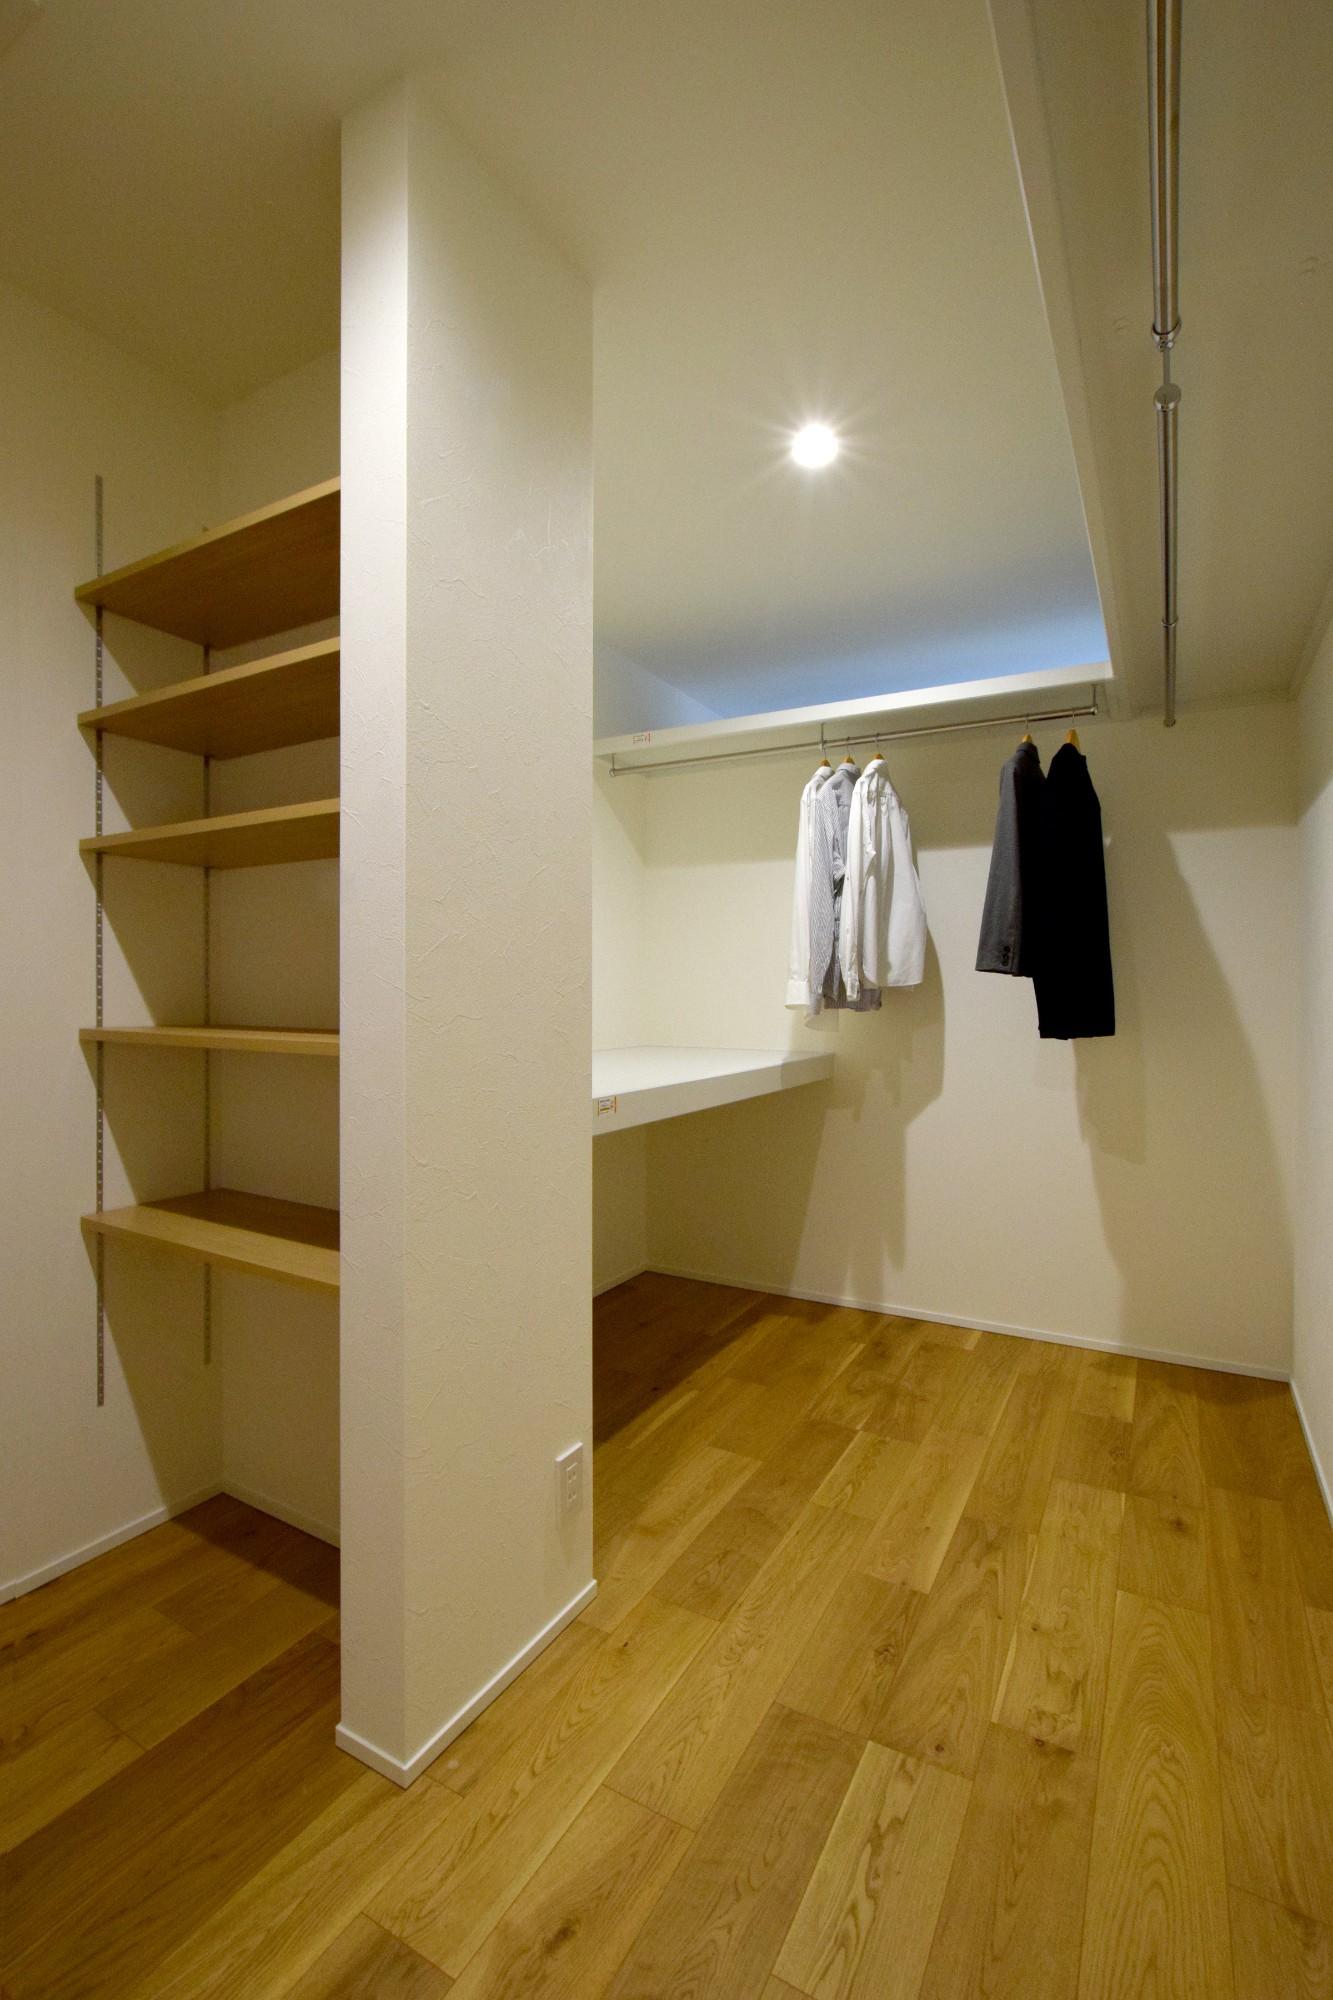 DETAIL HOME(ディテールホーム)「オークを基調としたナチュラルモダンな家」のシンプル・ナチュラルな収納スペースの実例写真